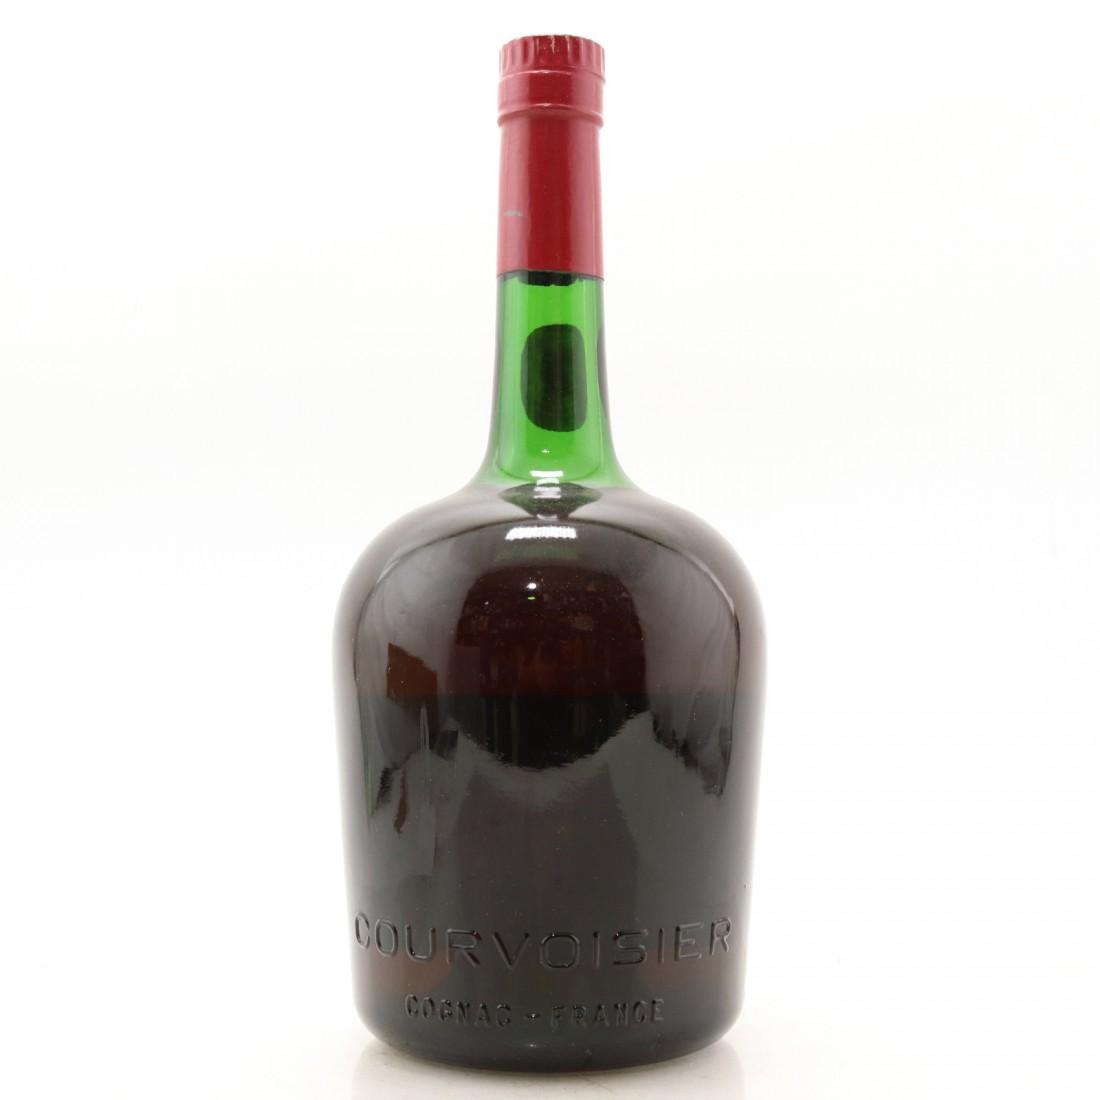 Courvoisier Three Star Cognac 1.4 Litre